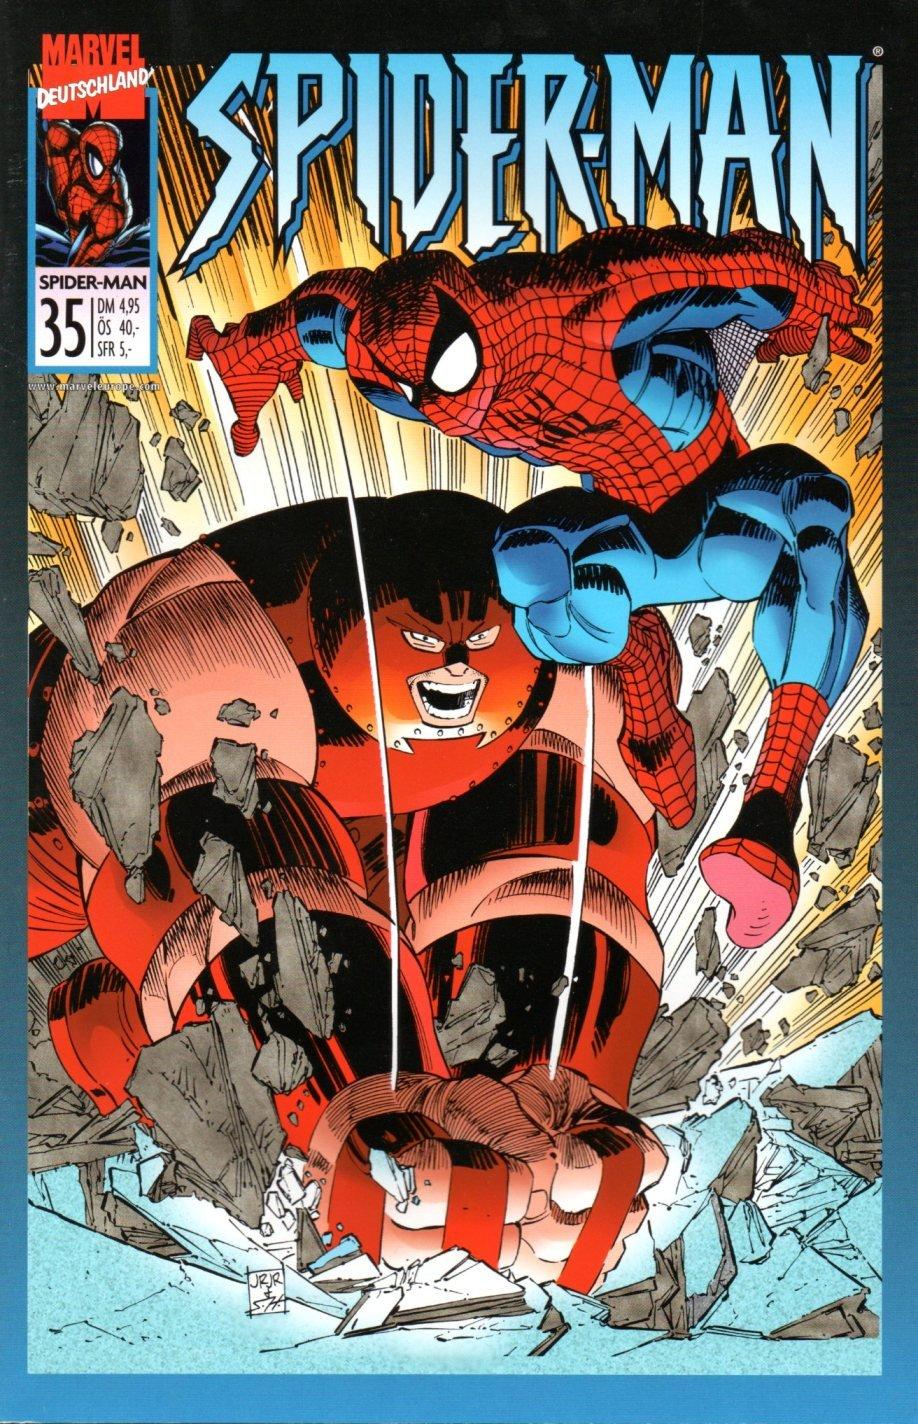 Marvel Comics, Spider-Man (1. Serie) - Großband 35 - Keiner stoppt Juggernaut! (Die Spinne) Comic – 1999 Panini B007ZE2R1O Belletristik - Comic Cartoon